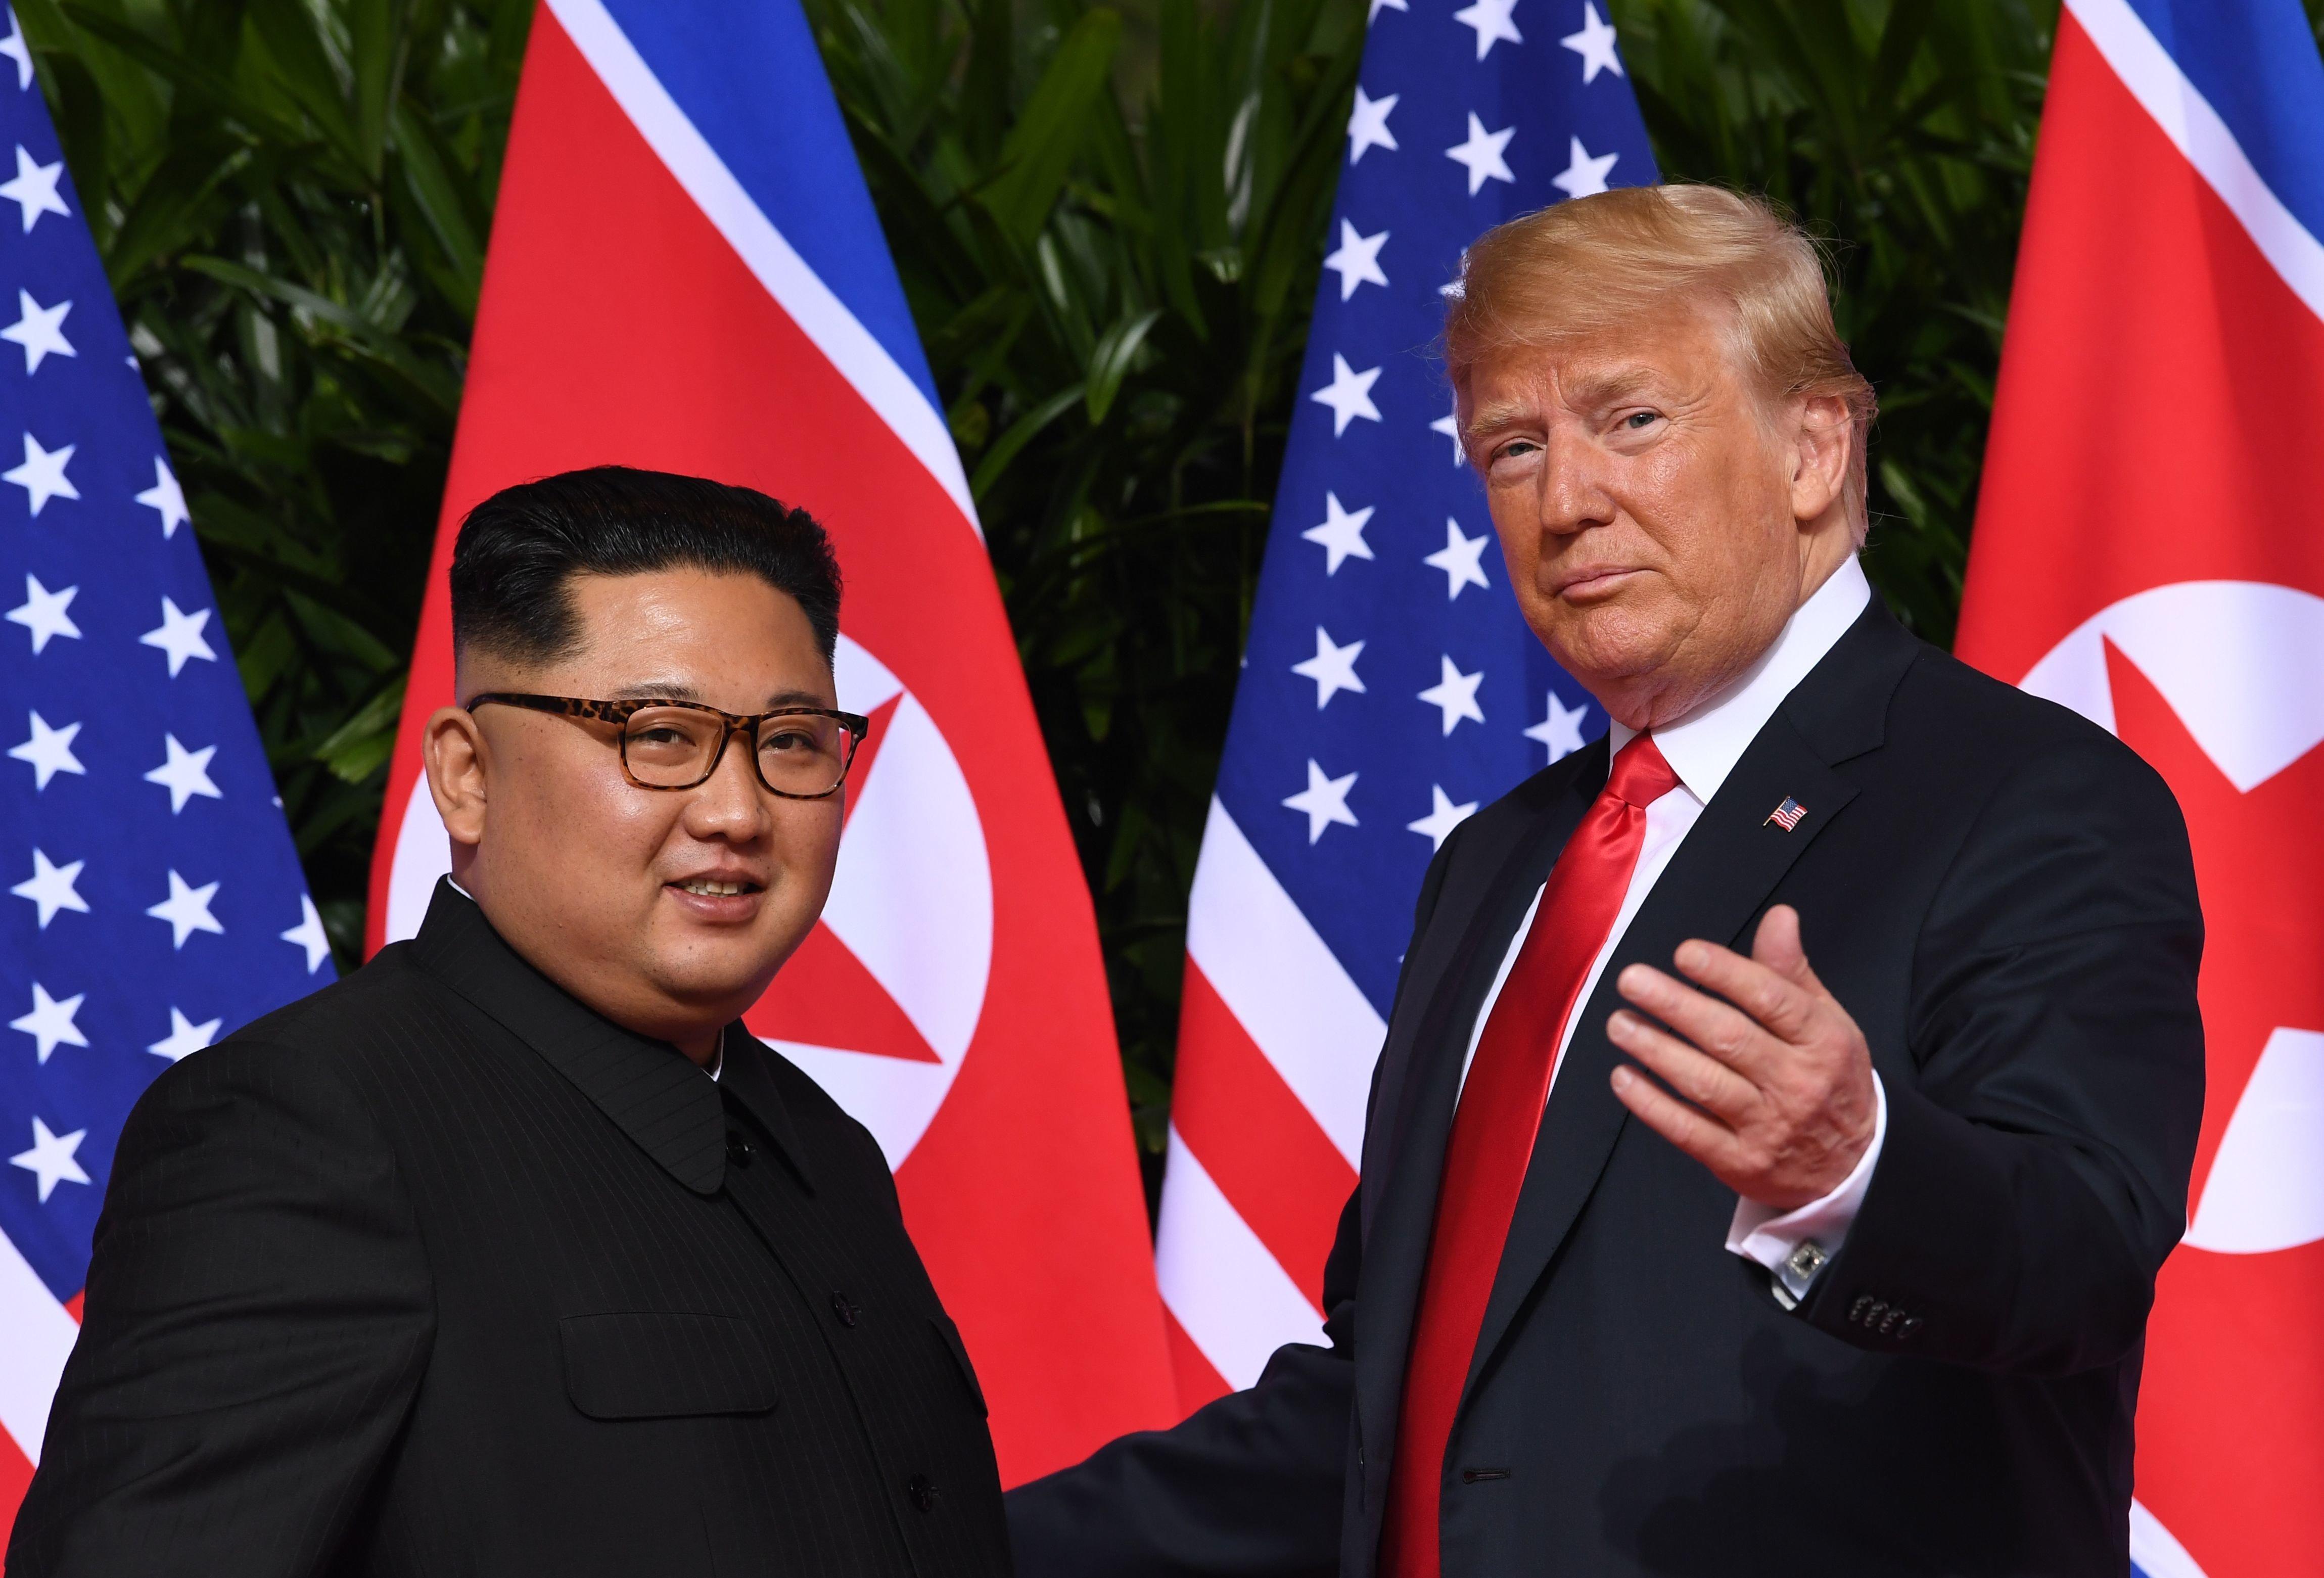 North Korea's leader Kim Jong Un andU.S. President Donald Trump at the start of their summitin Singapore